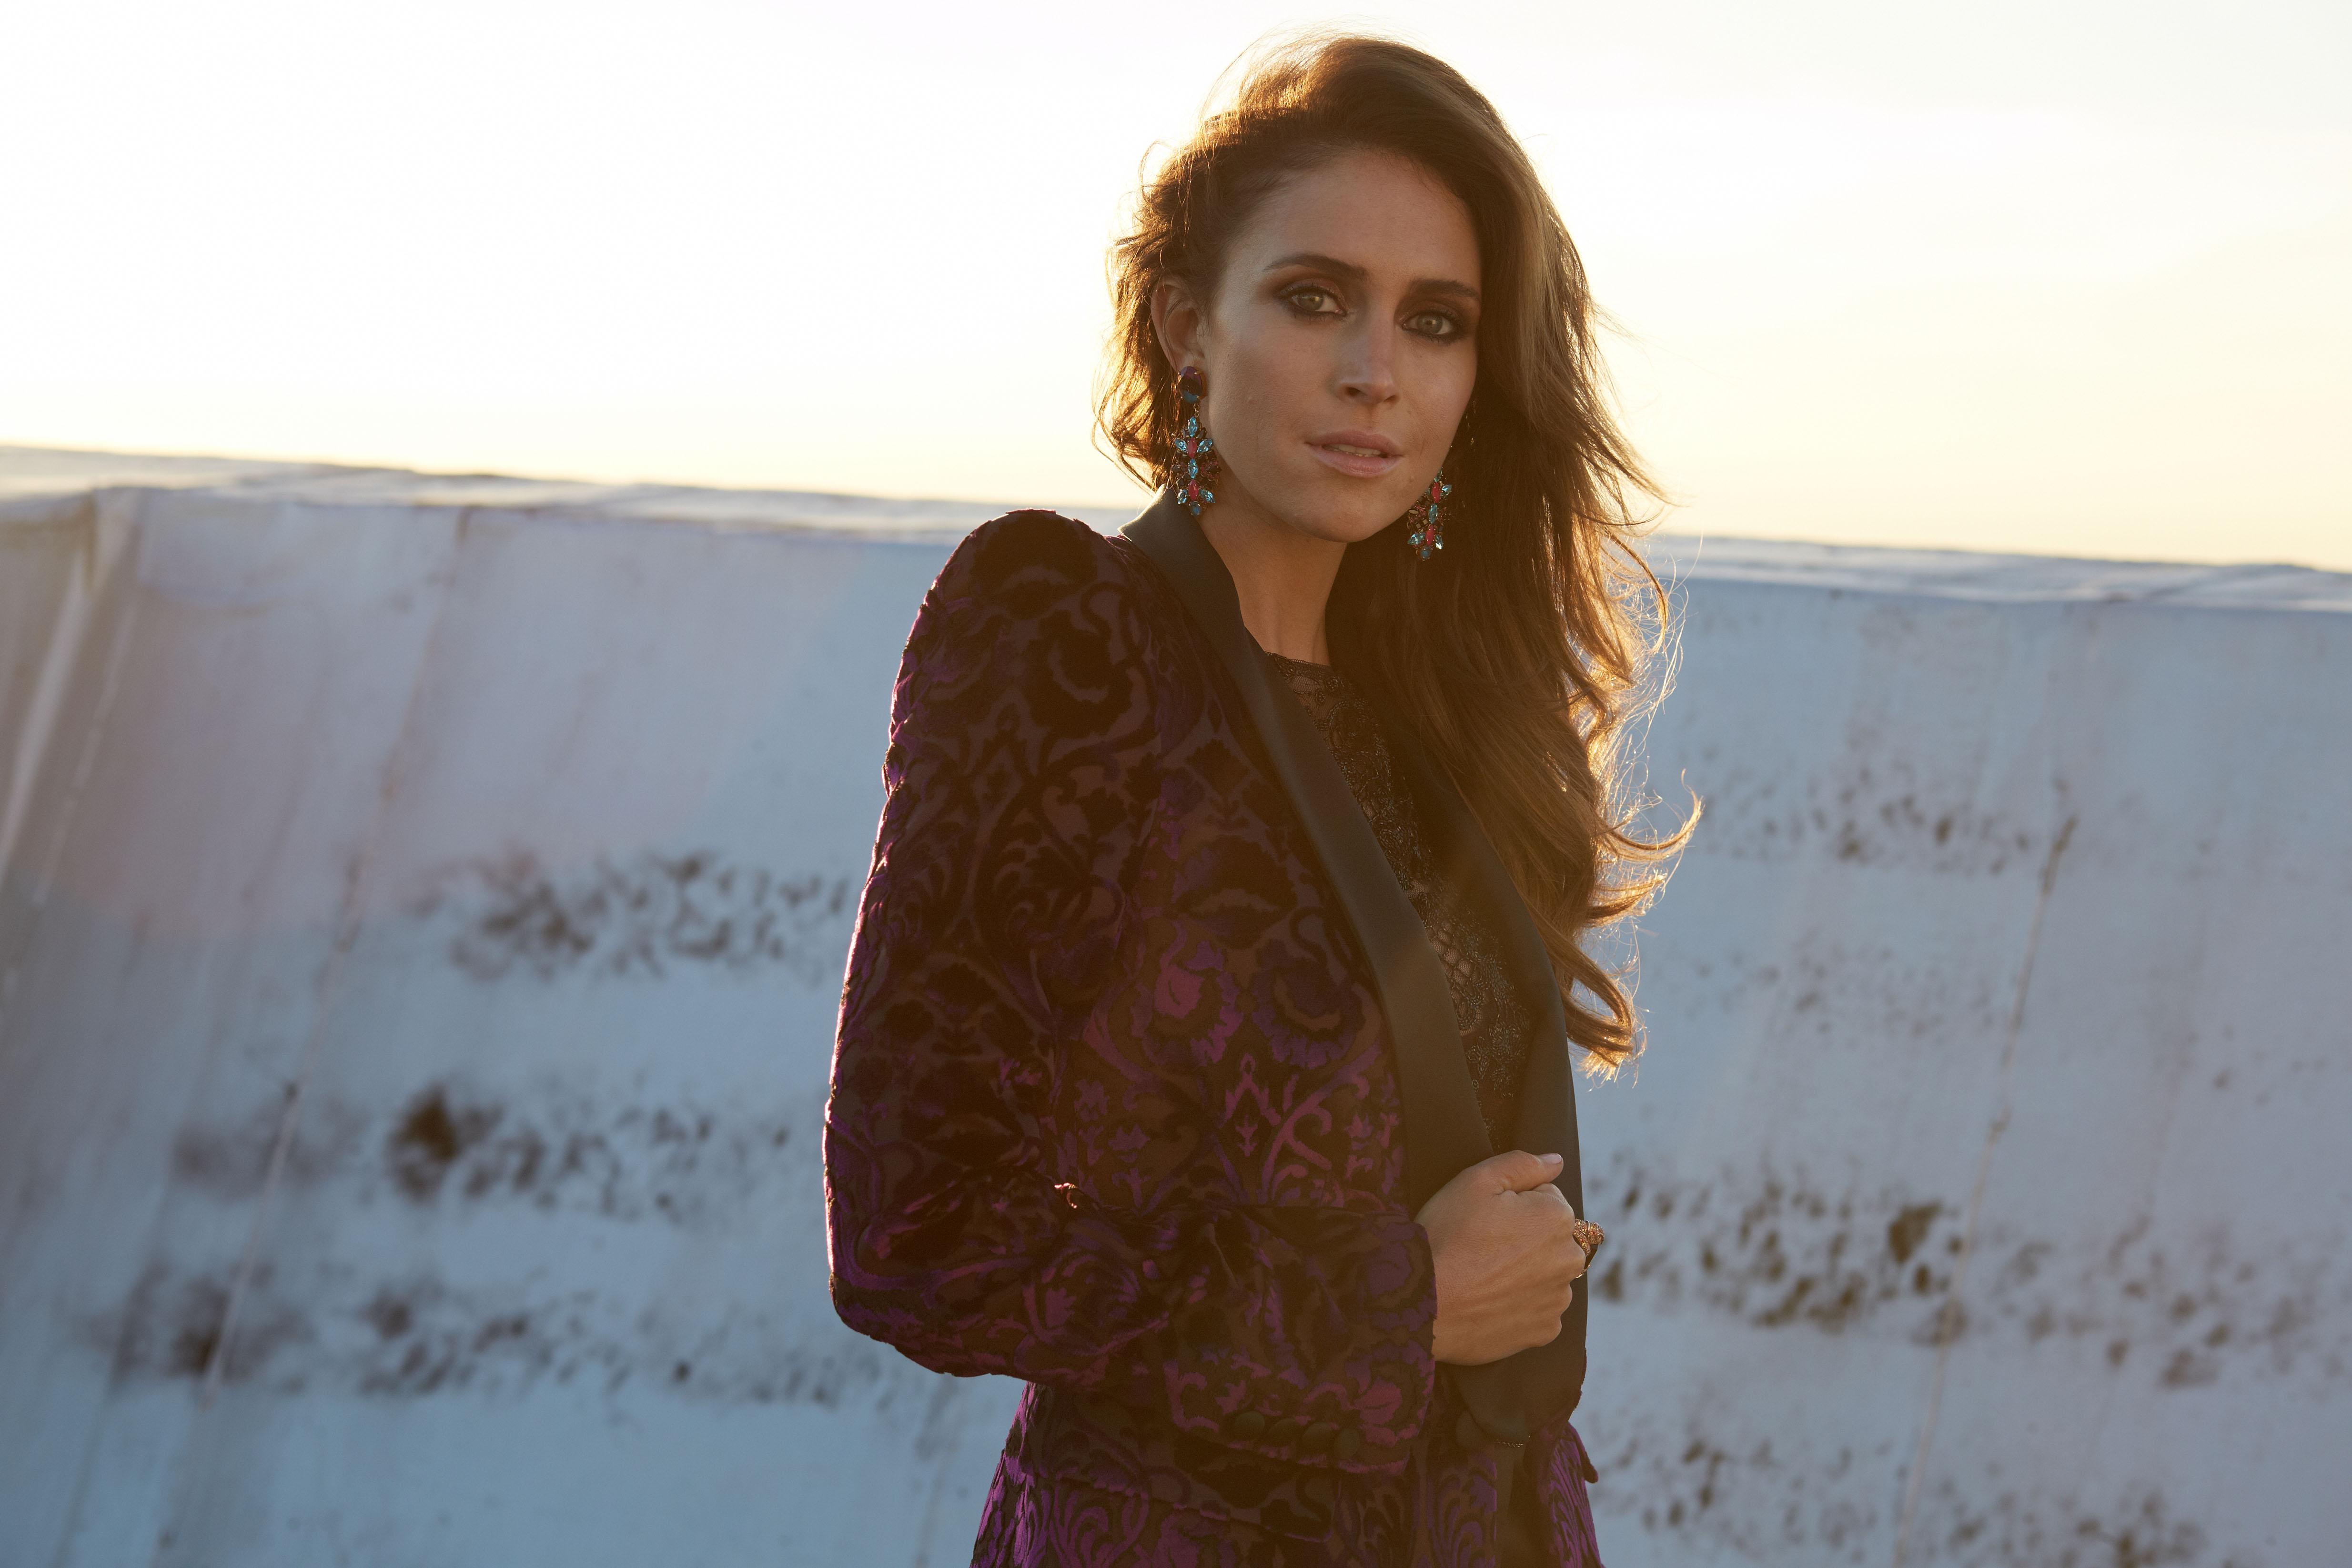 Kelleigh Bannen Hopes 'Church Clothes' Invites Listeners to Show Their Vulnerabilities